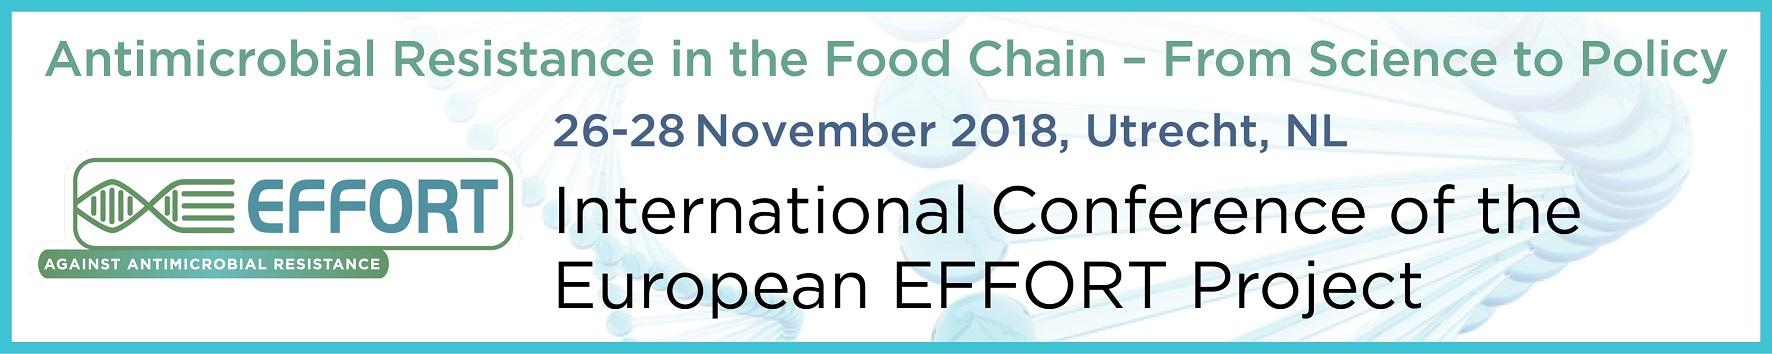 EFFORT International Conference Announcement